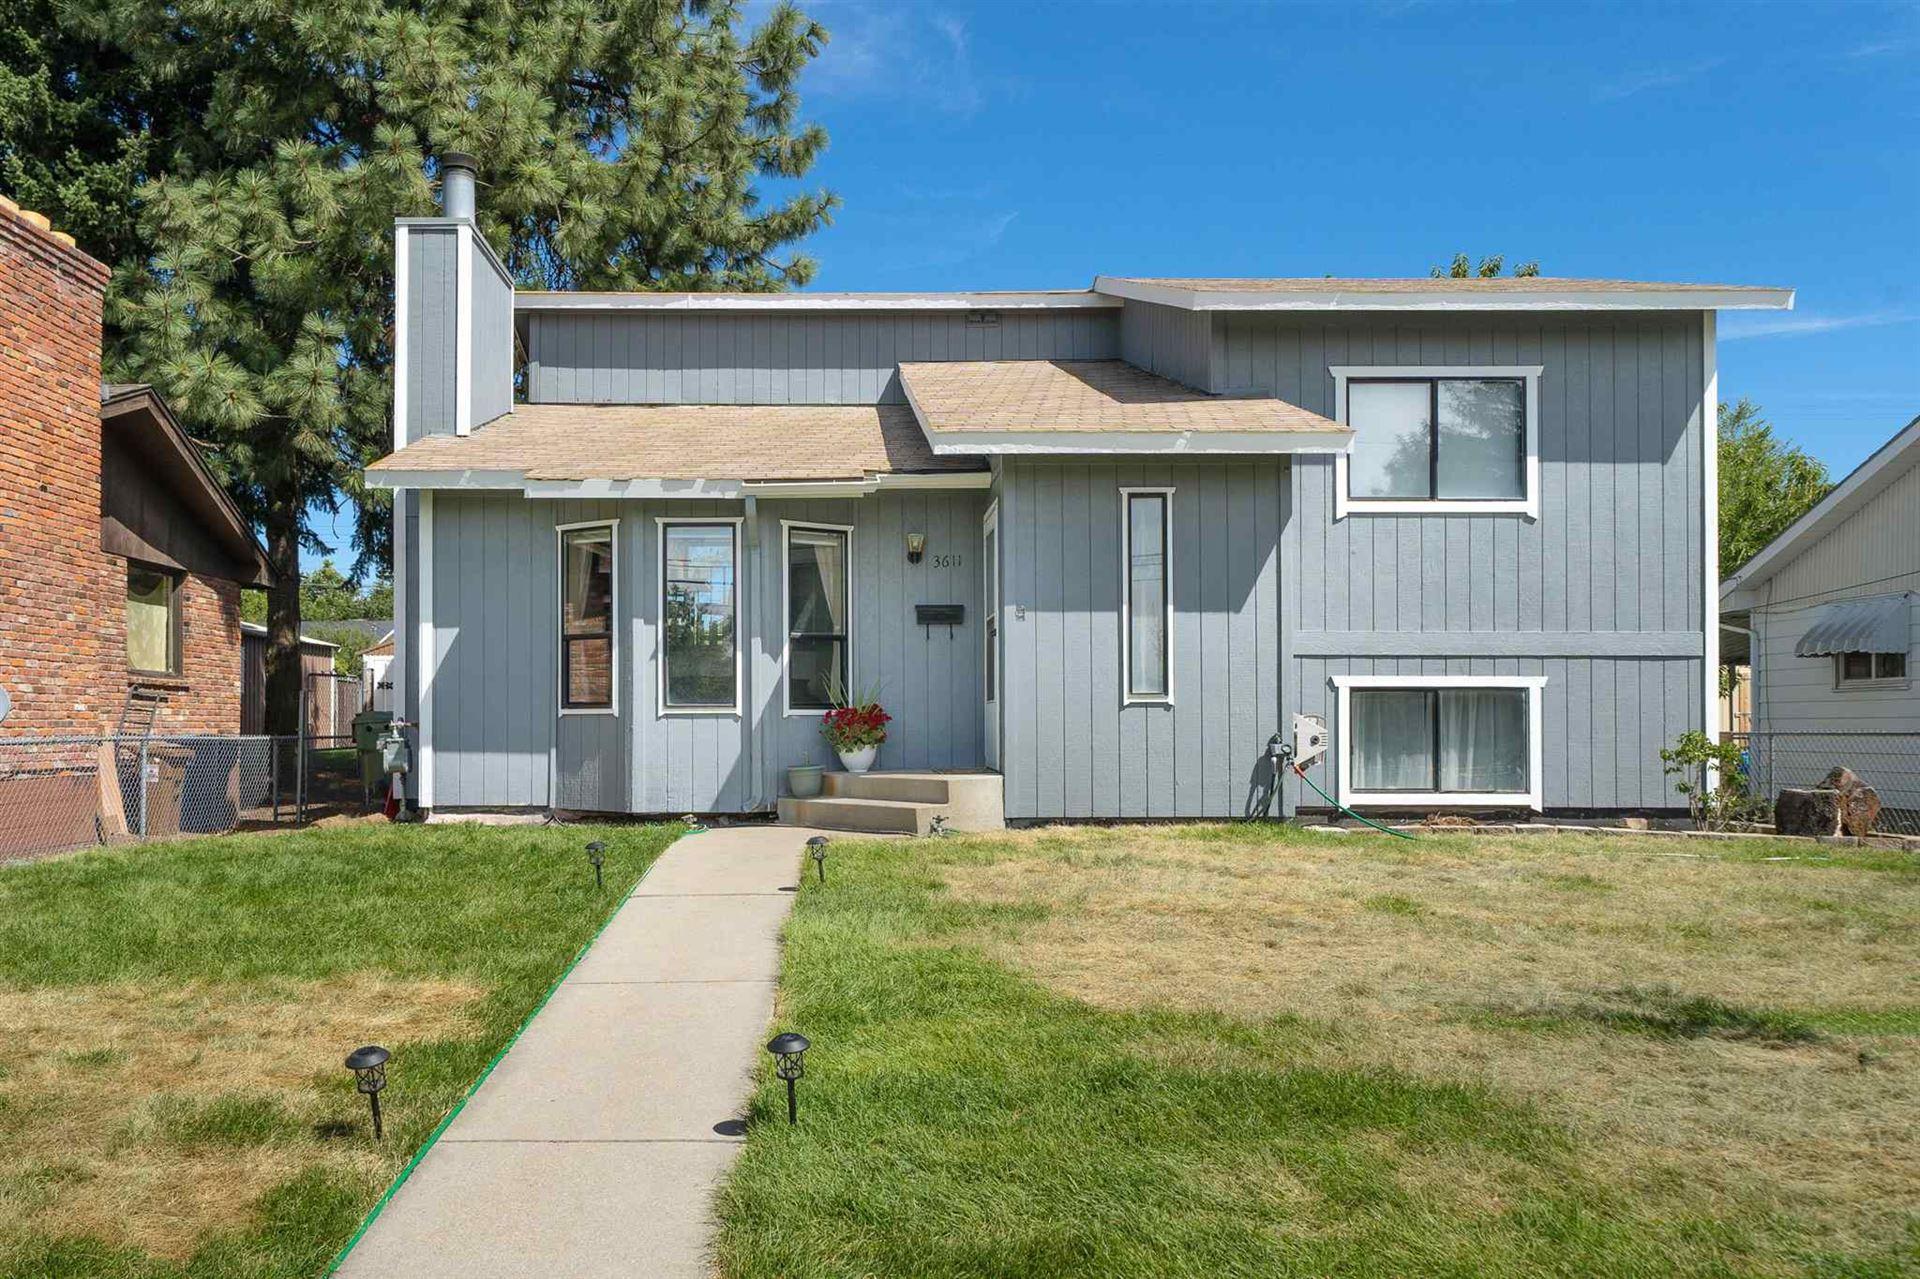 3611 E Euclid Ave, Spokane, WA 99217 - #: 202119682